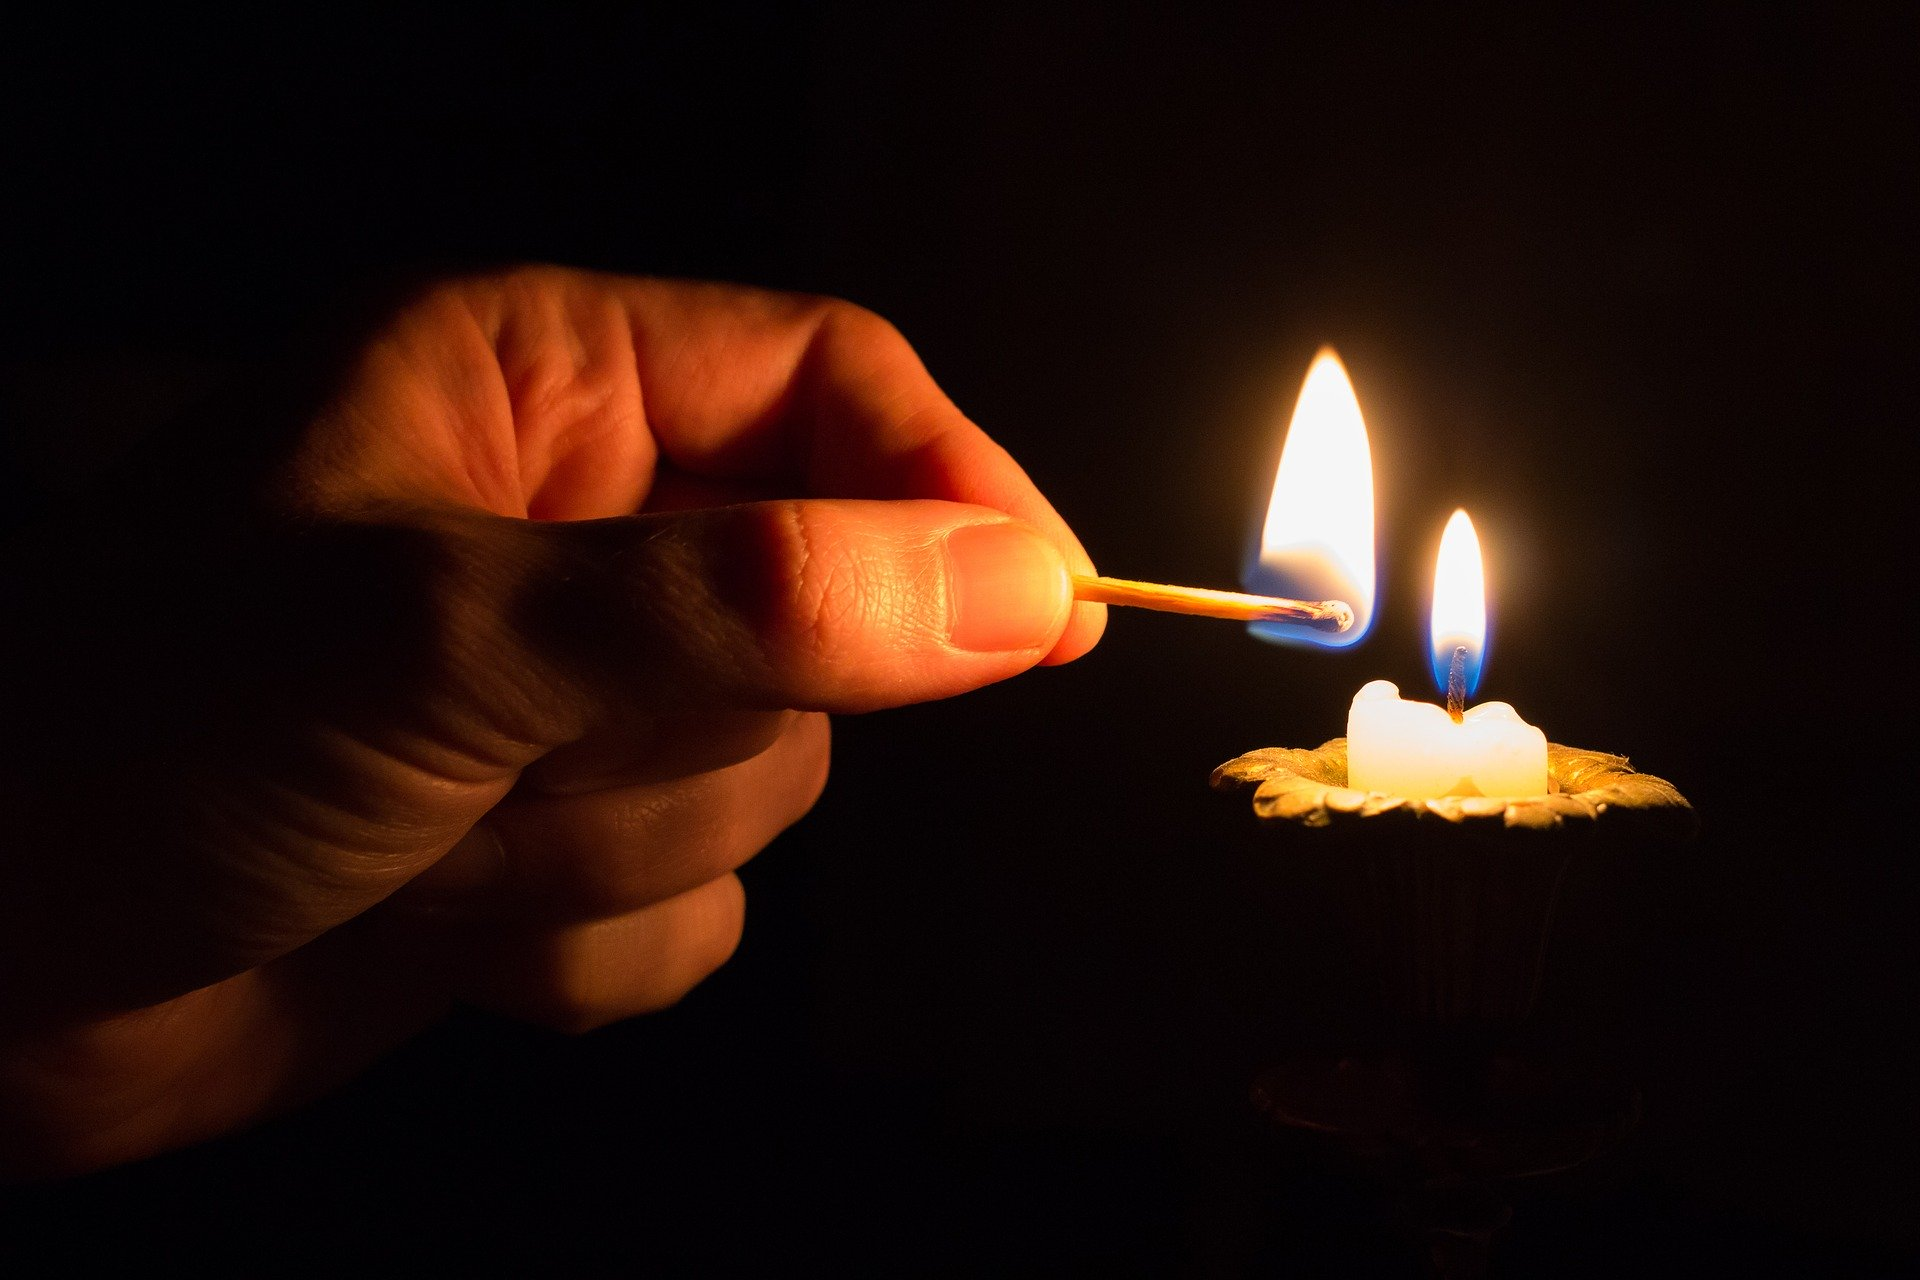 lighting a candle for Caroline Flack